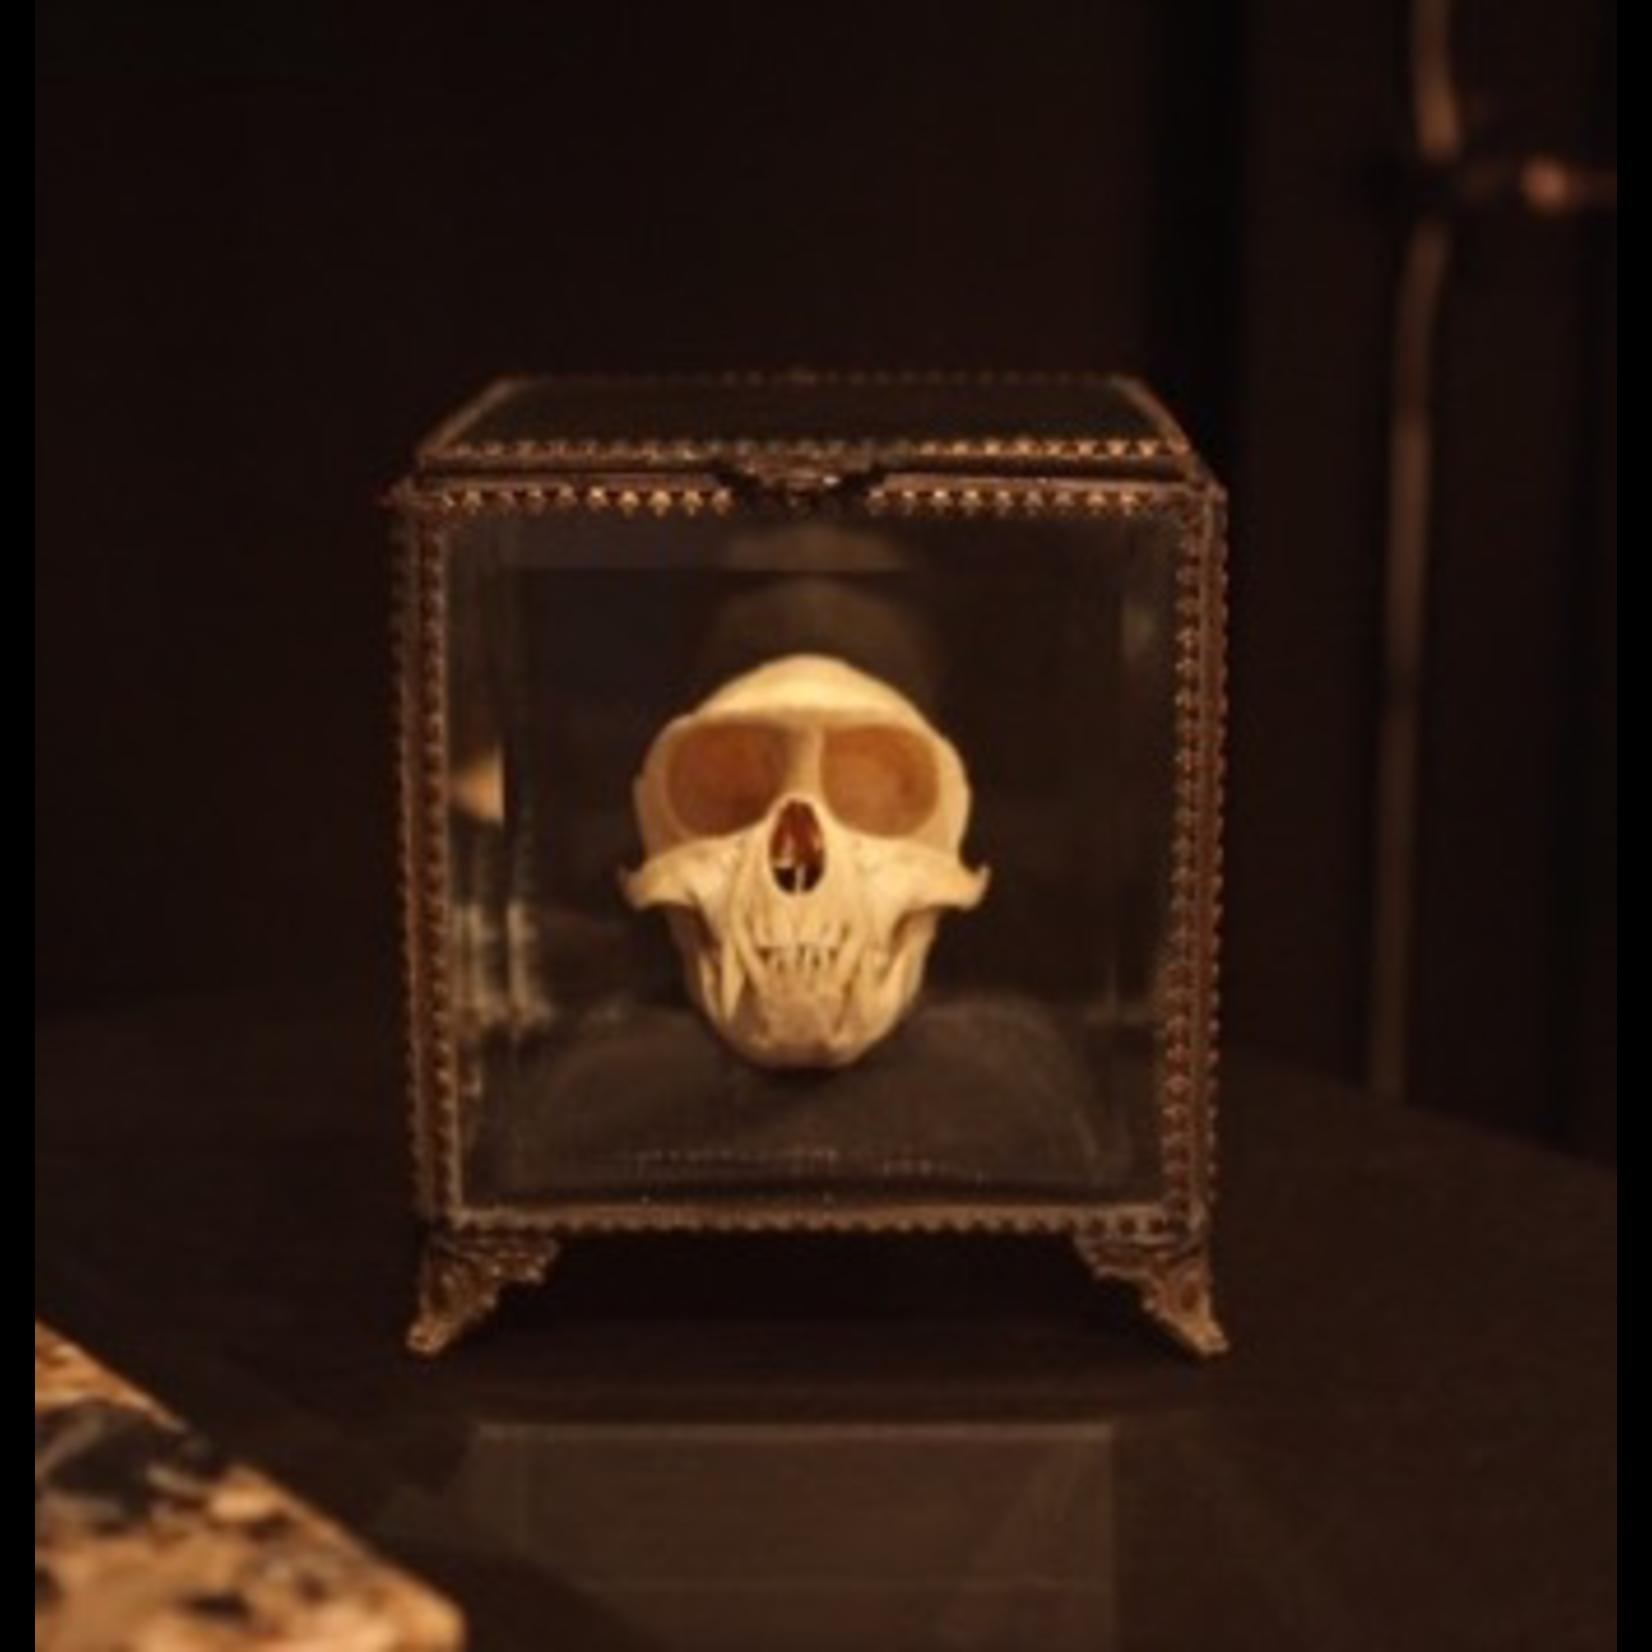 OBJET DE CURIOSITE MONKEY SKULL IN GLASS BOX